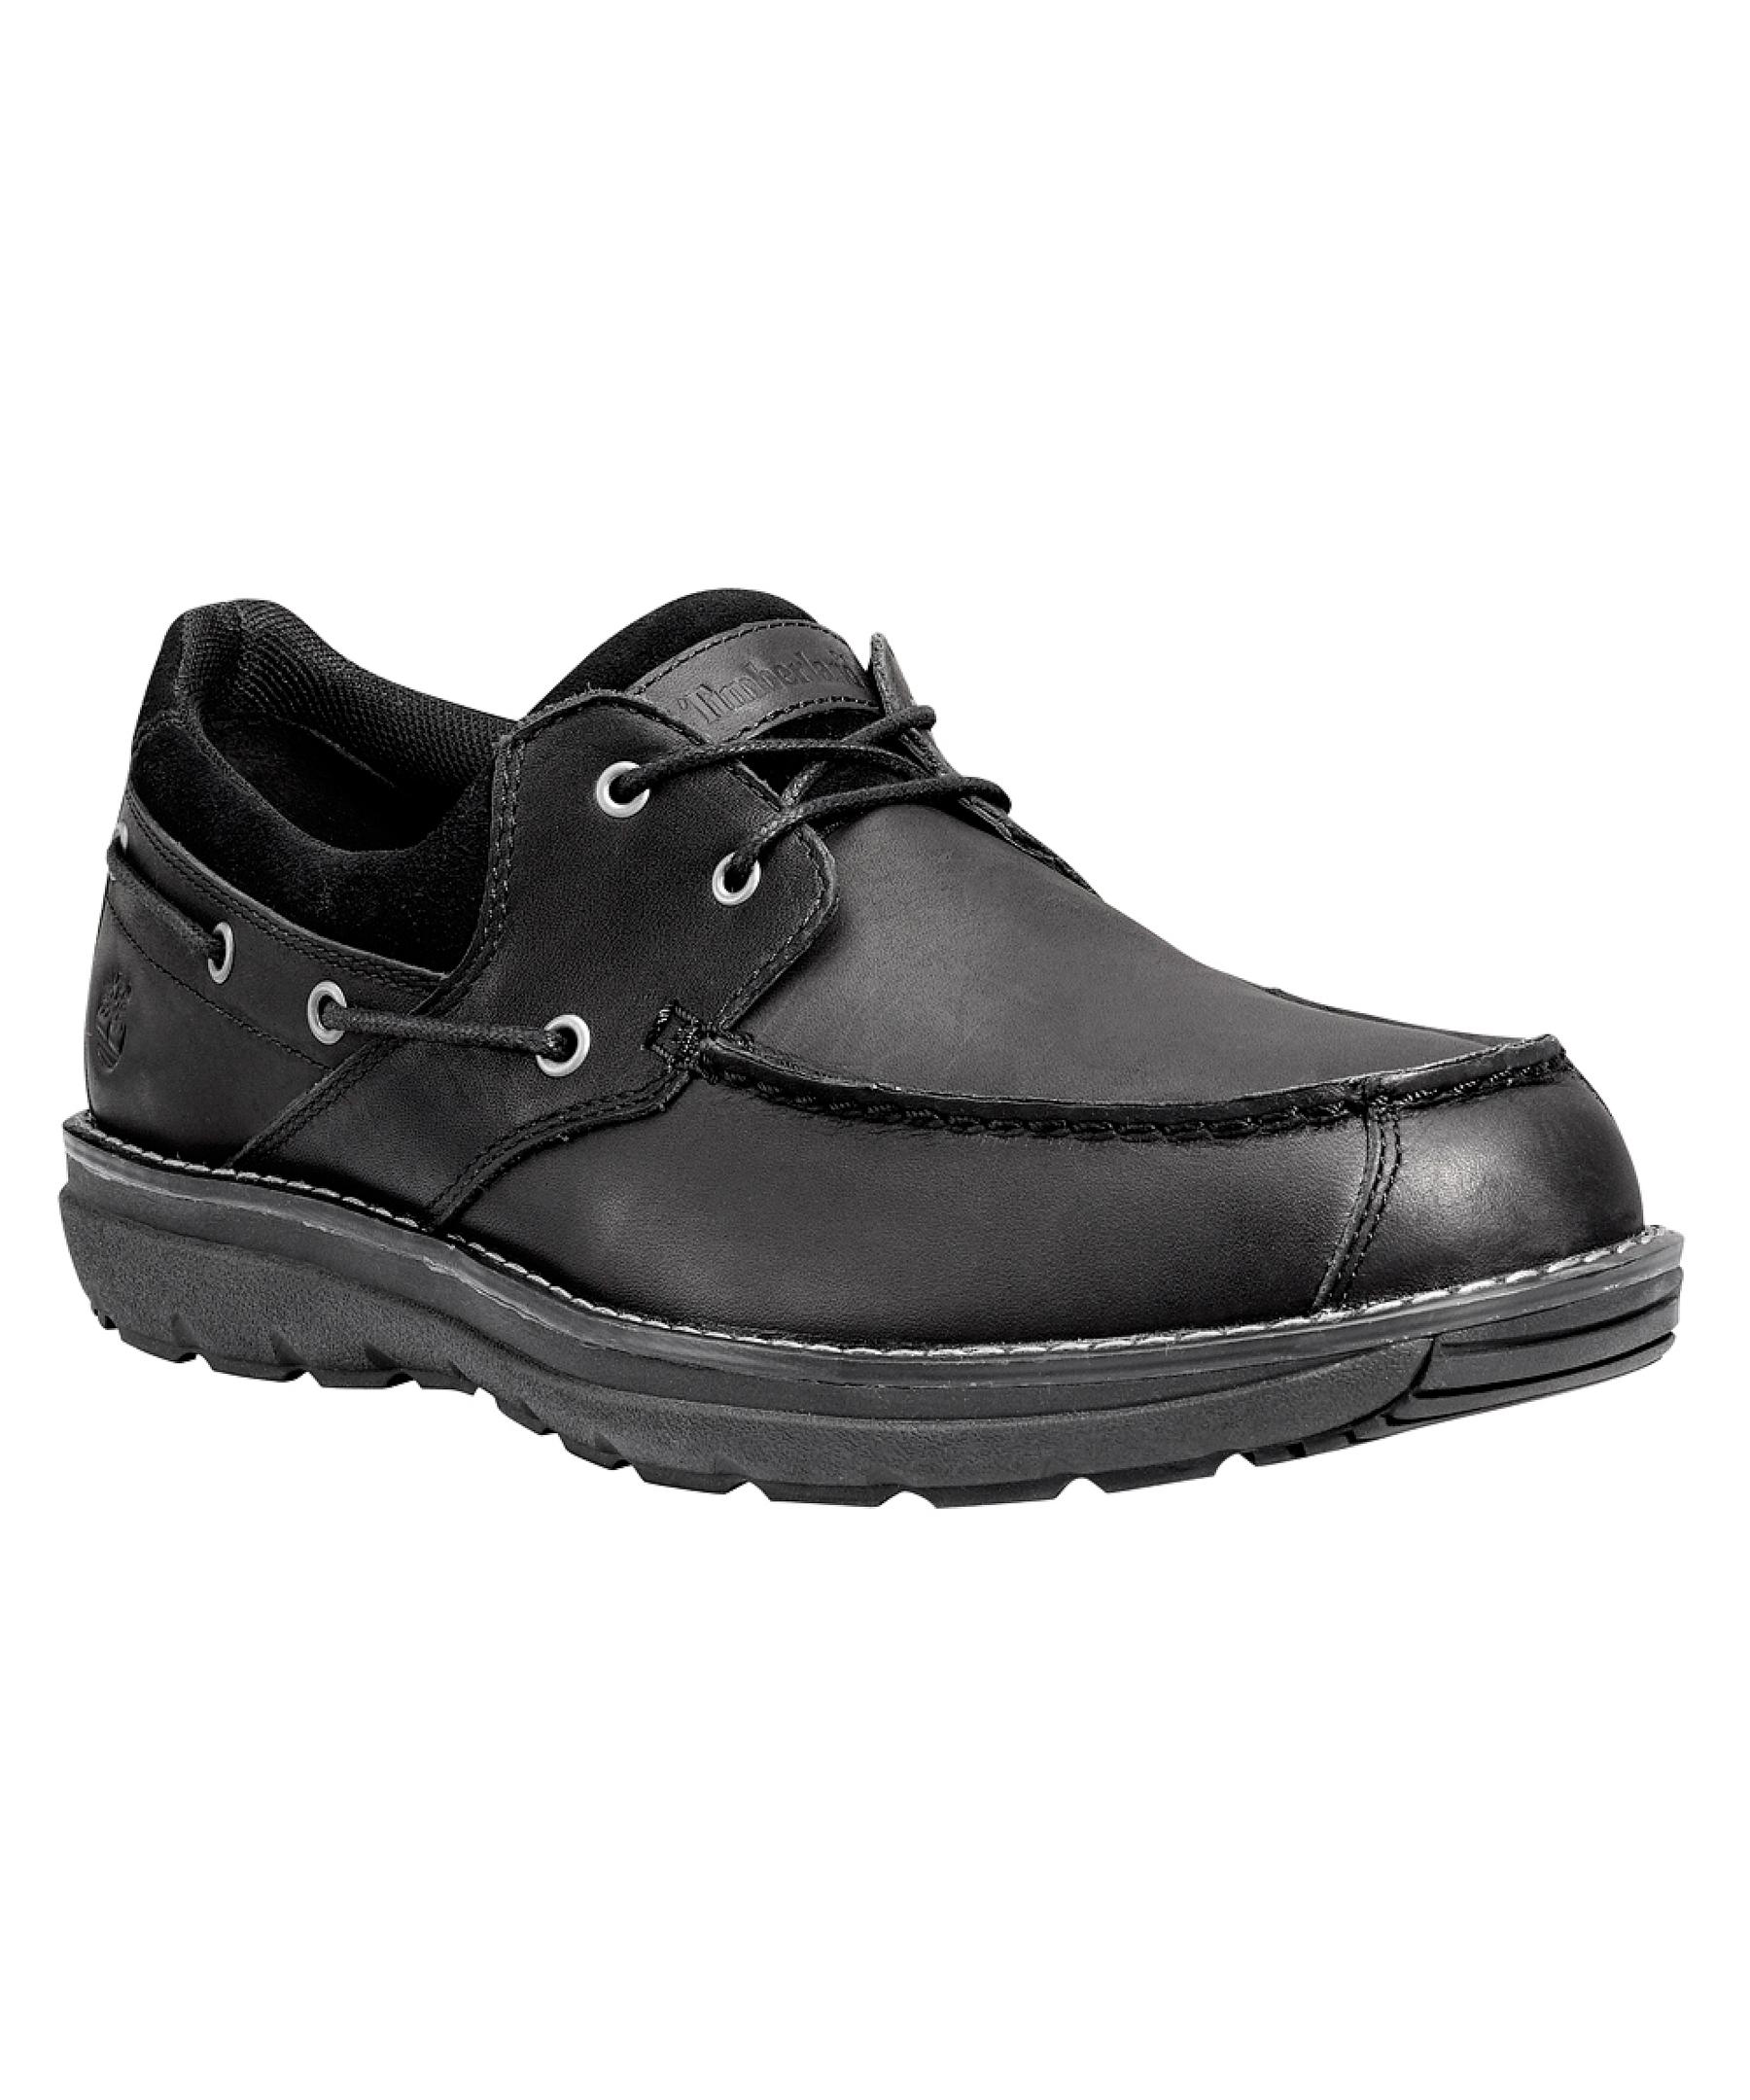 Timberland Menu0026#39;s Barrett Park 2-eye Boat Athletic Boating Shoes In Black For Men | Lyst